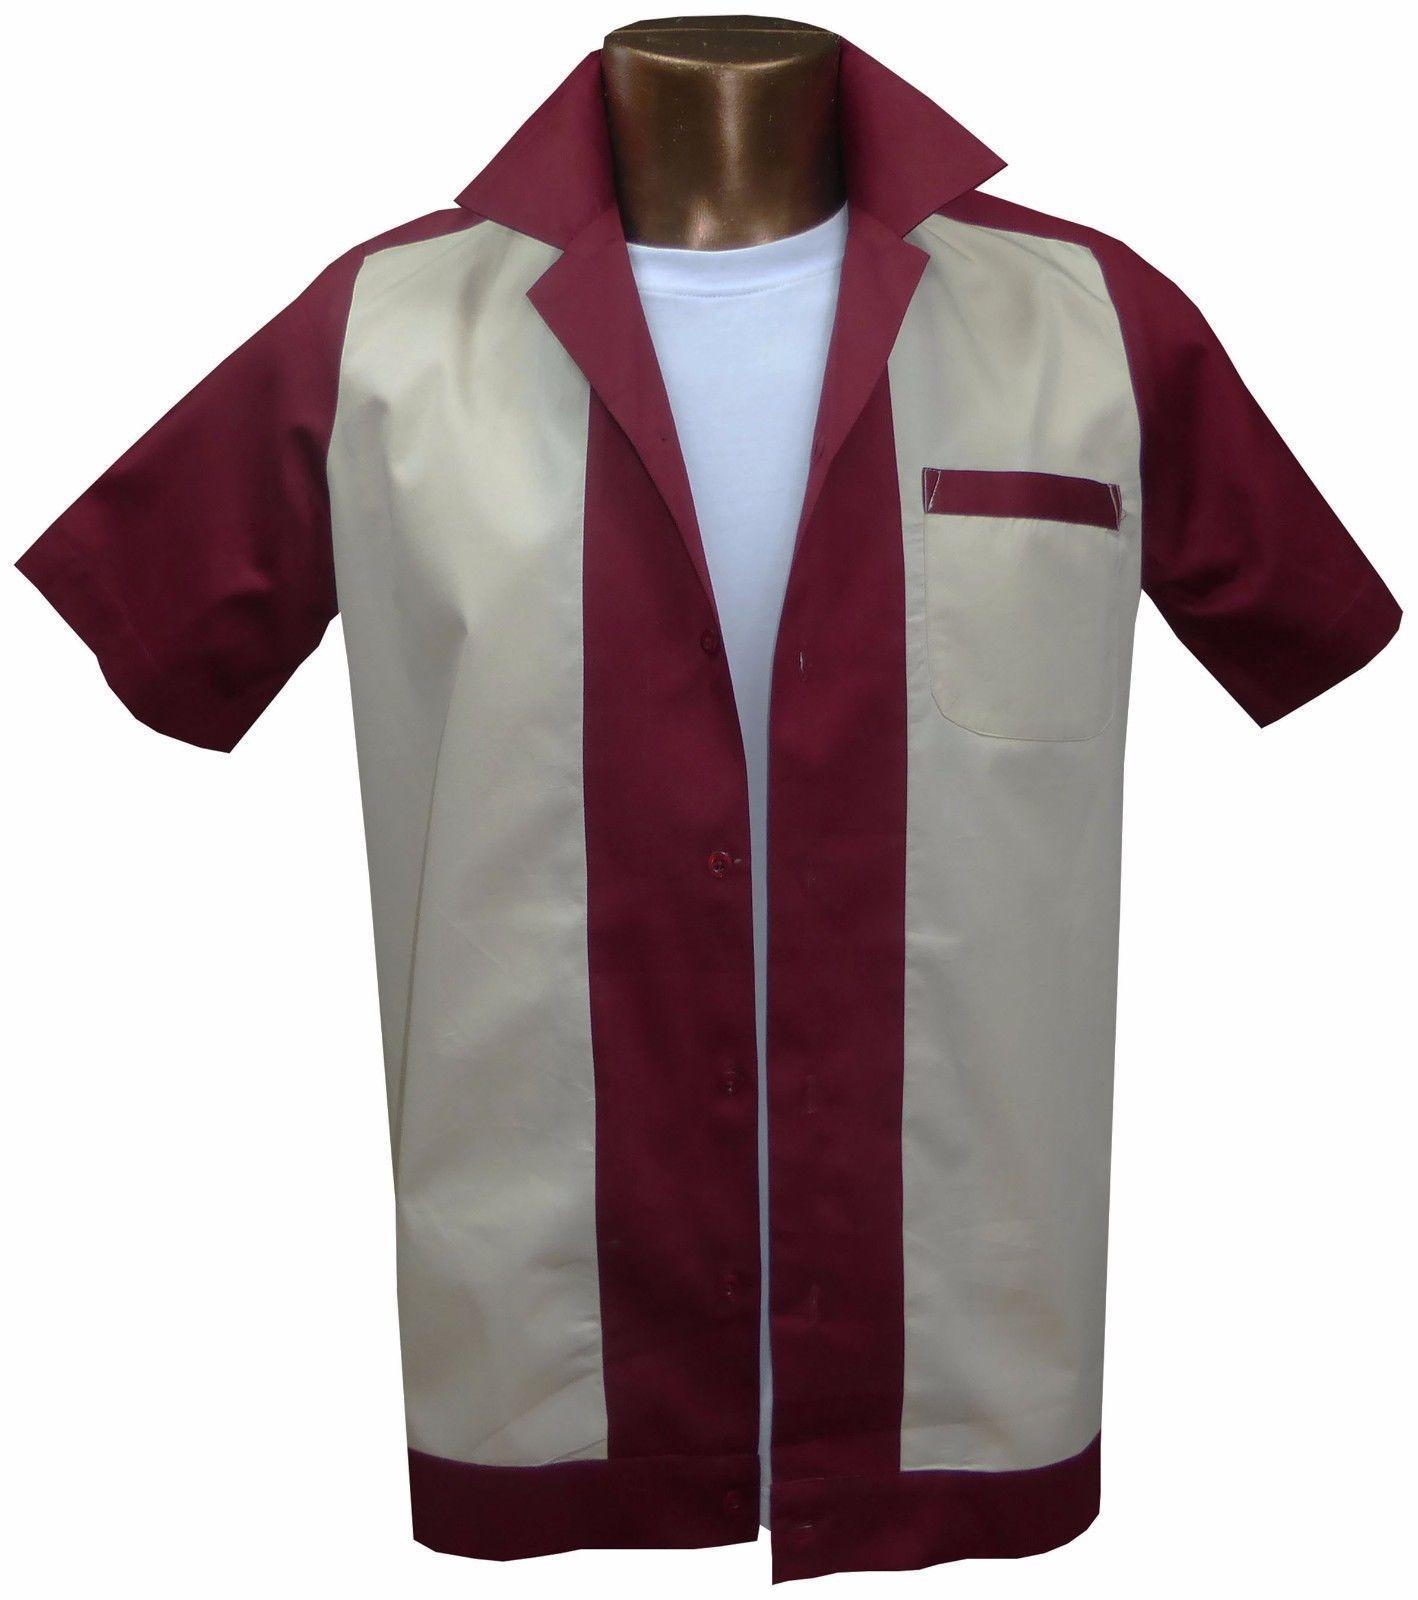 Vintage Mens Shirt Retro 1950s//1960s Rockabilly,Bowling